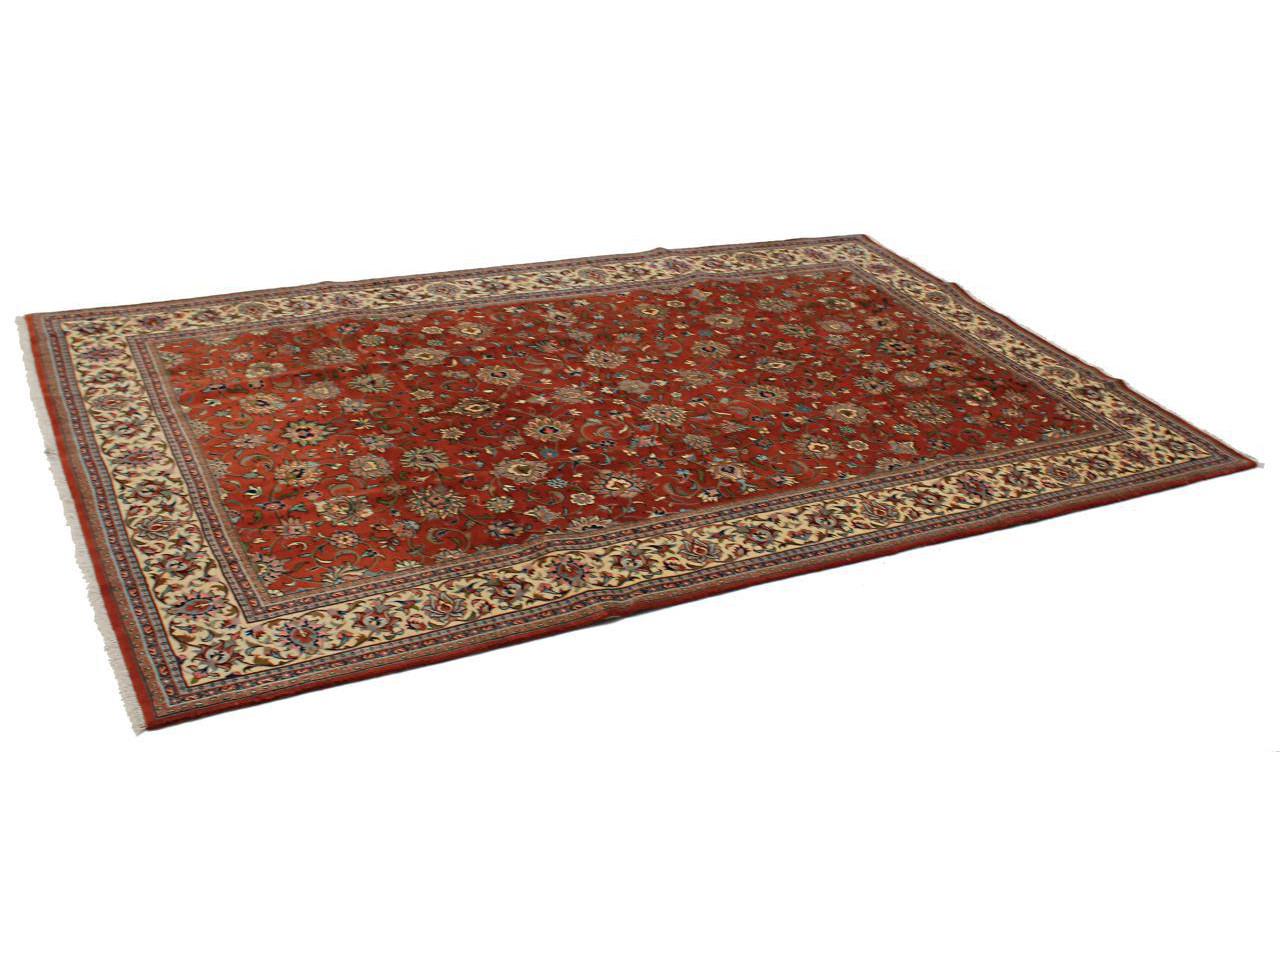 Sarough sherkat tapis persans n 4008 306x200cm - Tapis laine contemporain solde ...